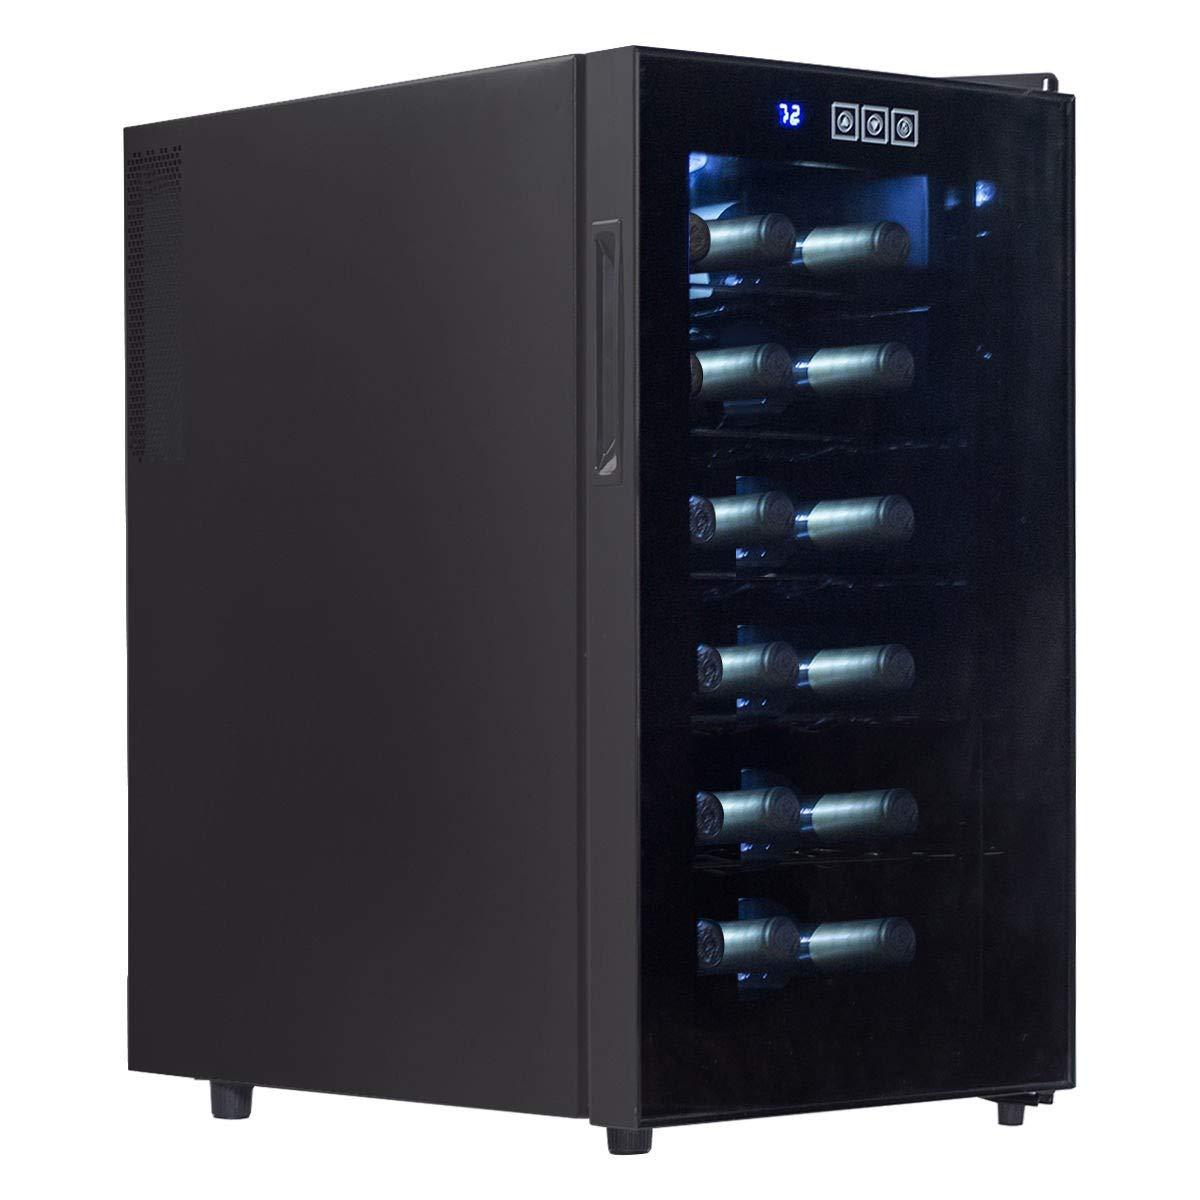 LHONE Mini Wine Cooler Fridge Freestanding Refrigerator Chiller Counter Top Wine Cellar with Digital Temperature Display Quiet Operation Fridge Black (18 Bottle)